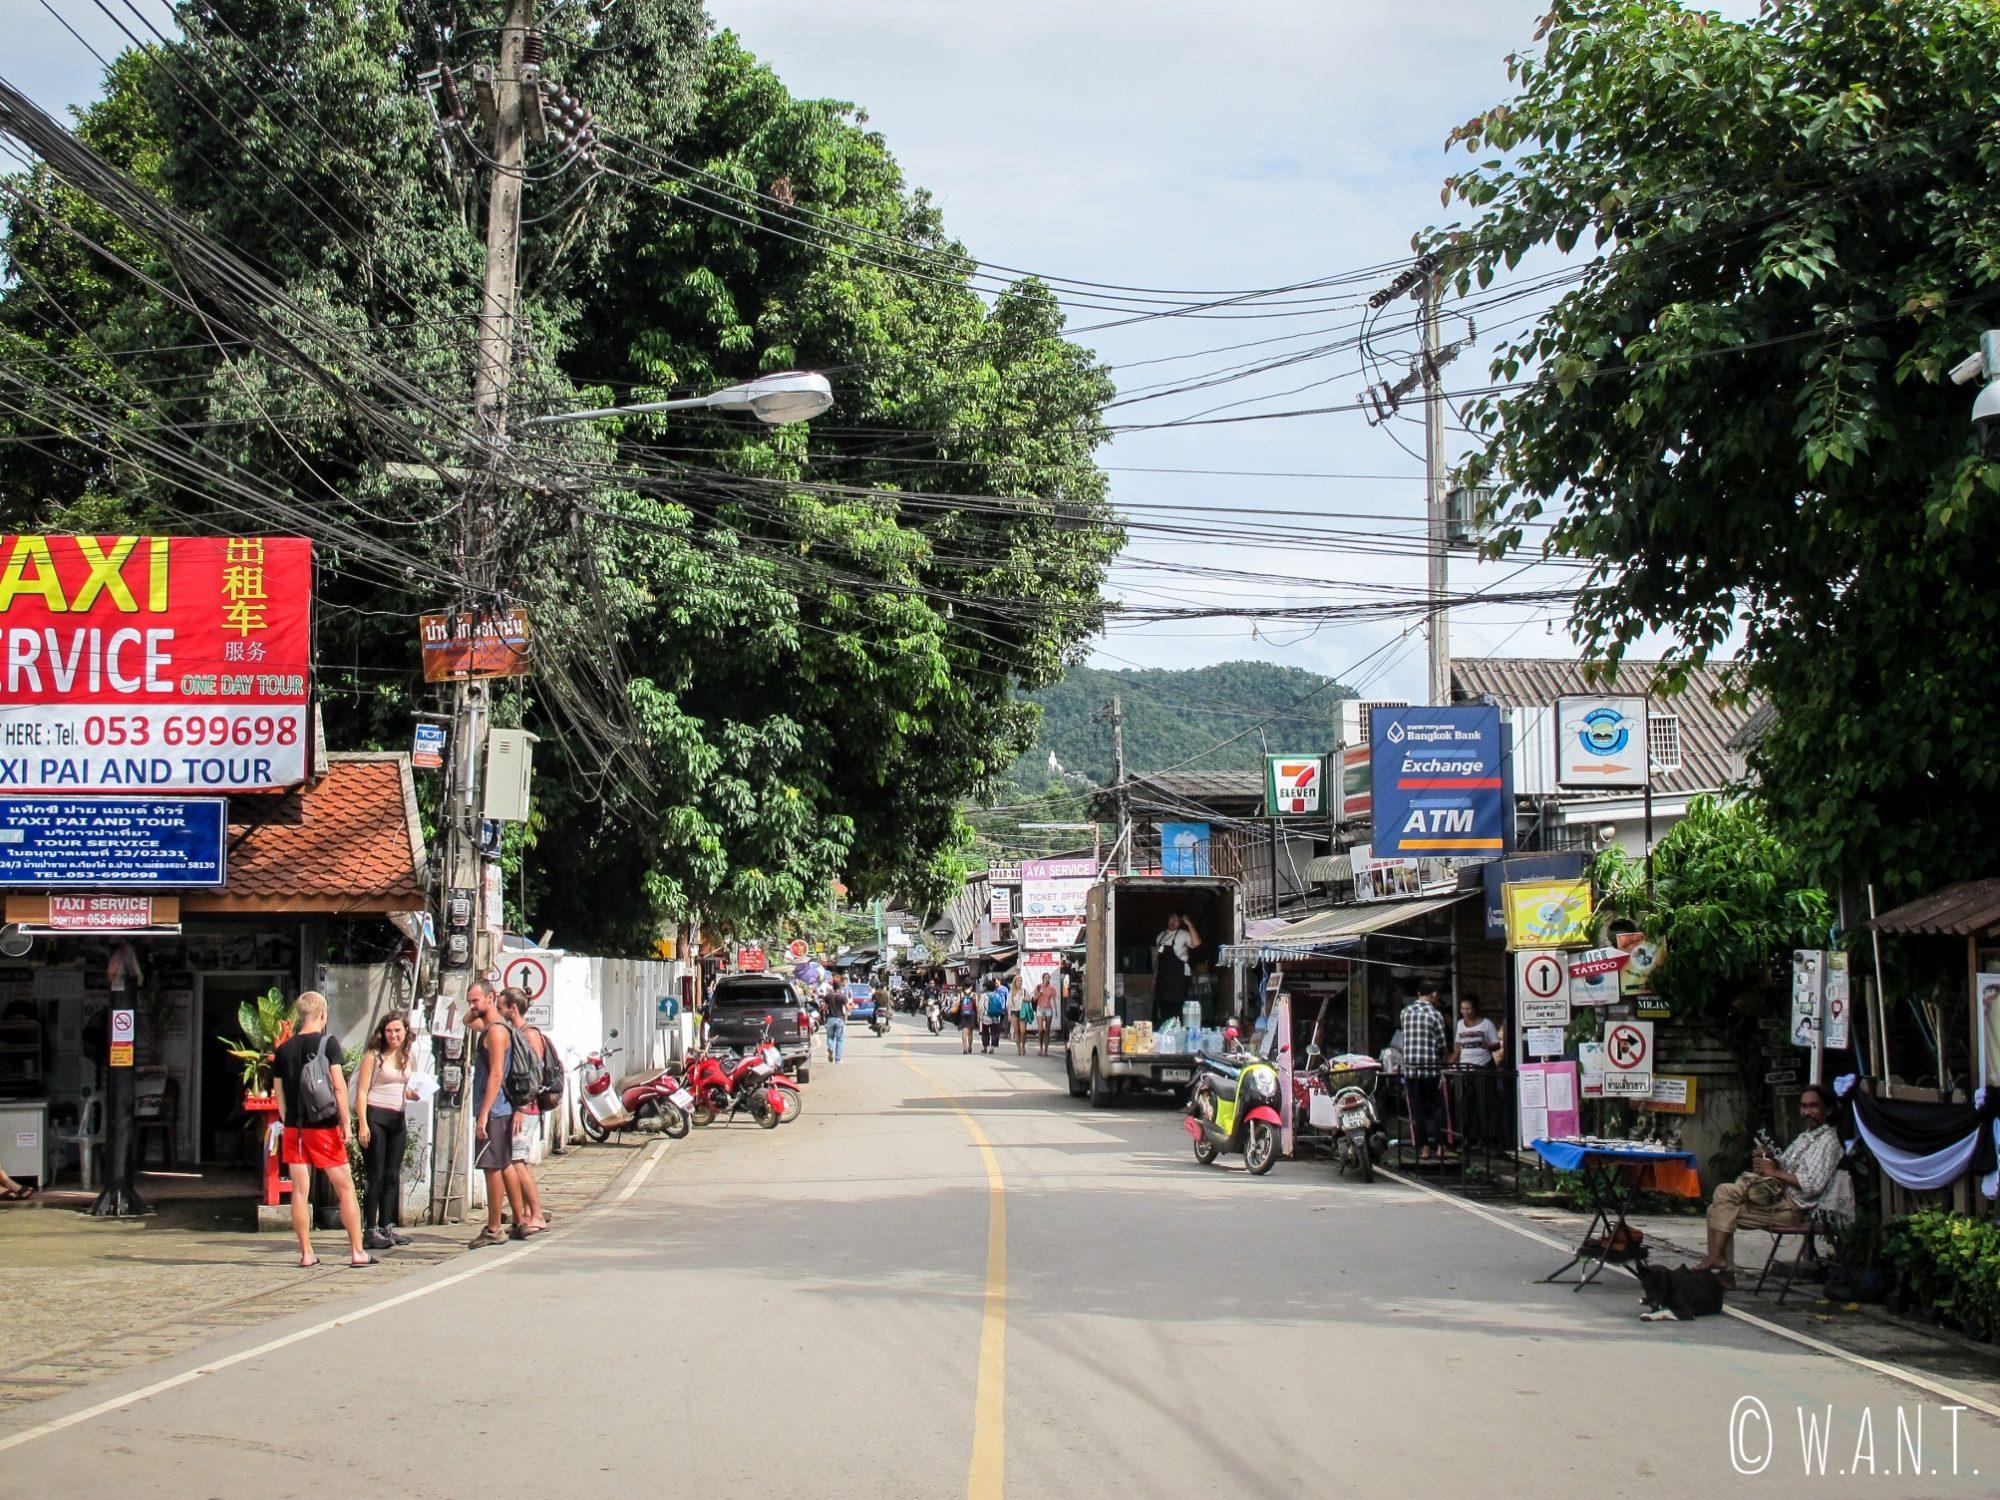 Rue de la gare routière de Pai